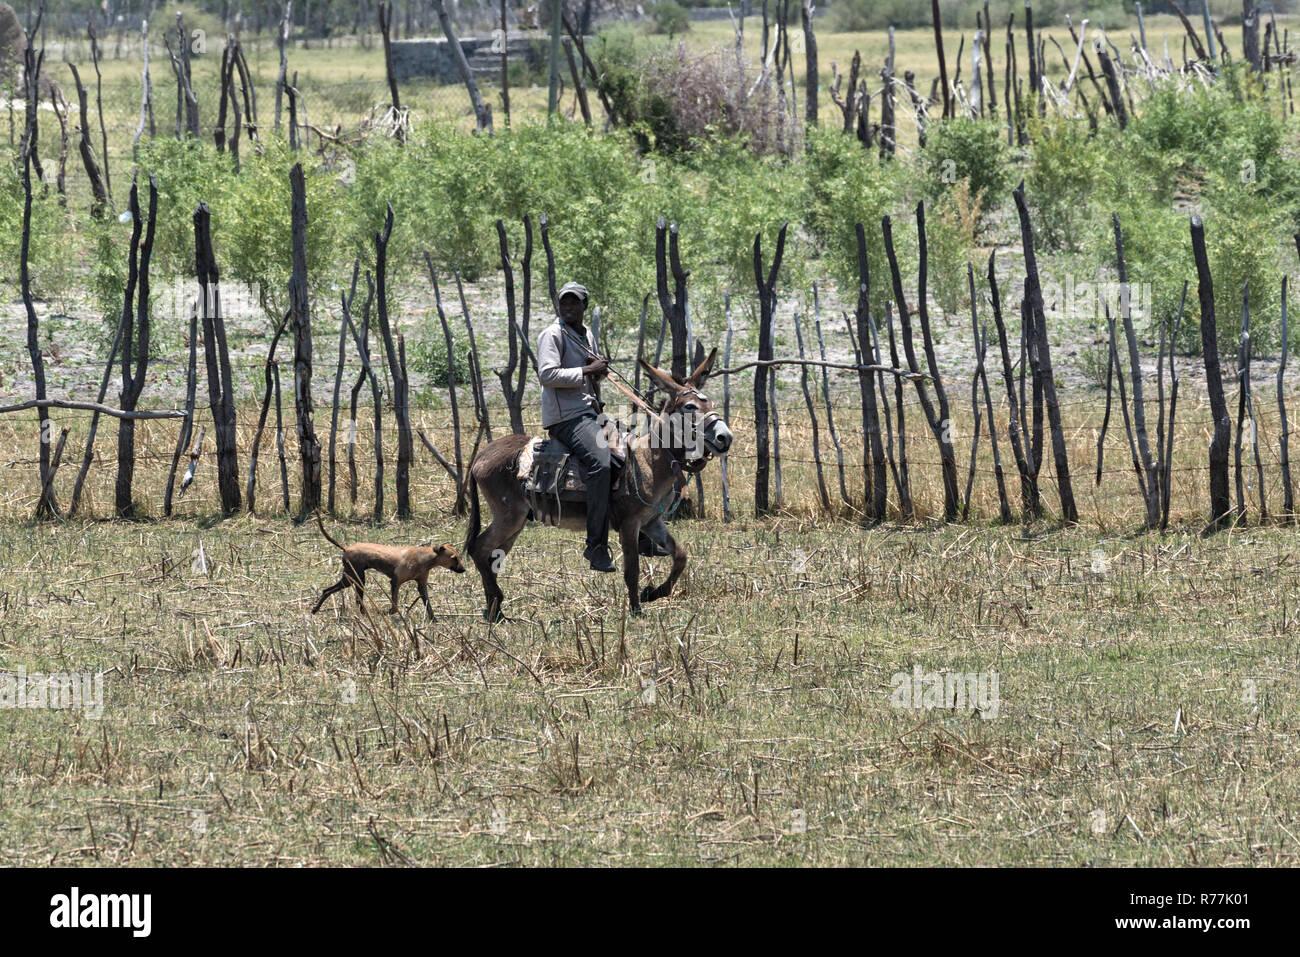 farmer riding on donkey on the bank of thamalakane, okavango river in the north of maun, botswana - Stock Image